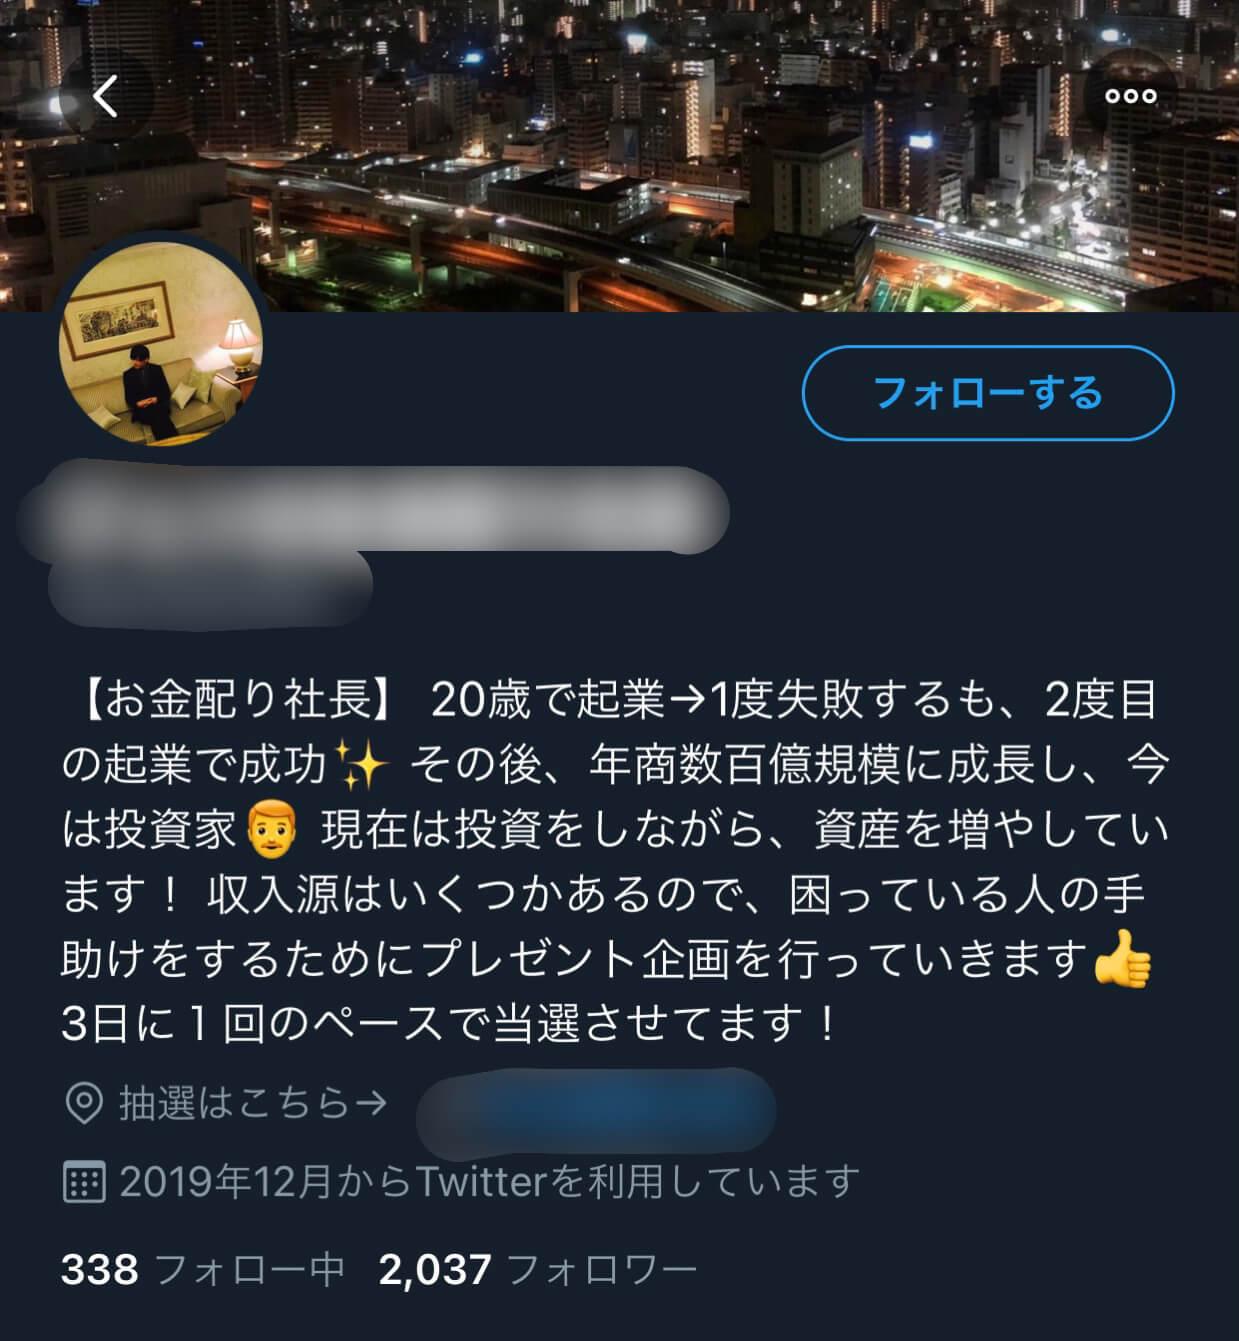 netbusiness-twitter